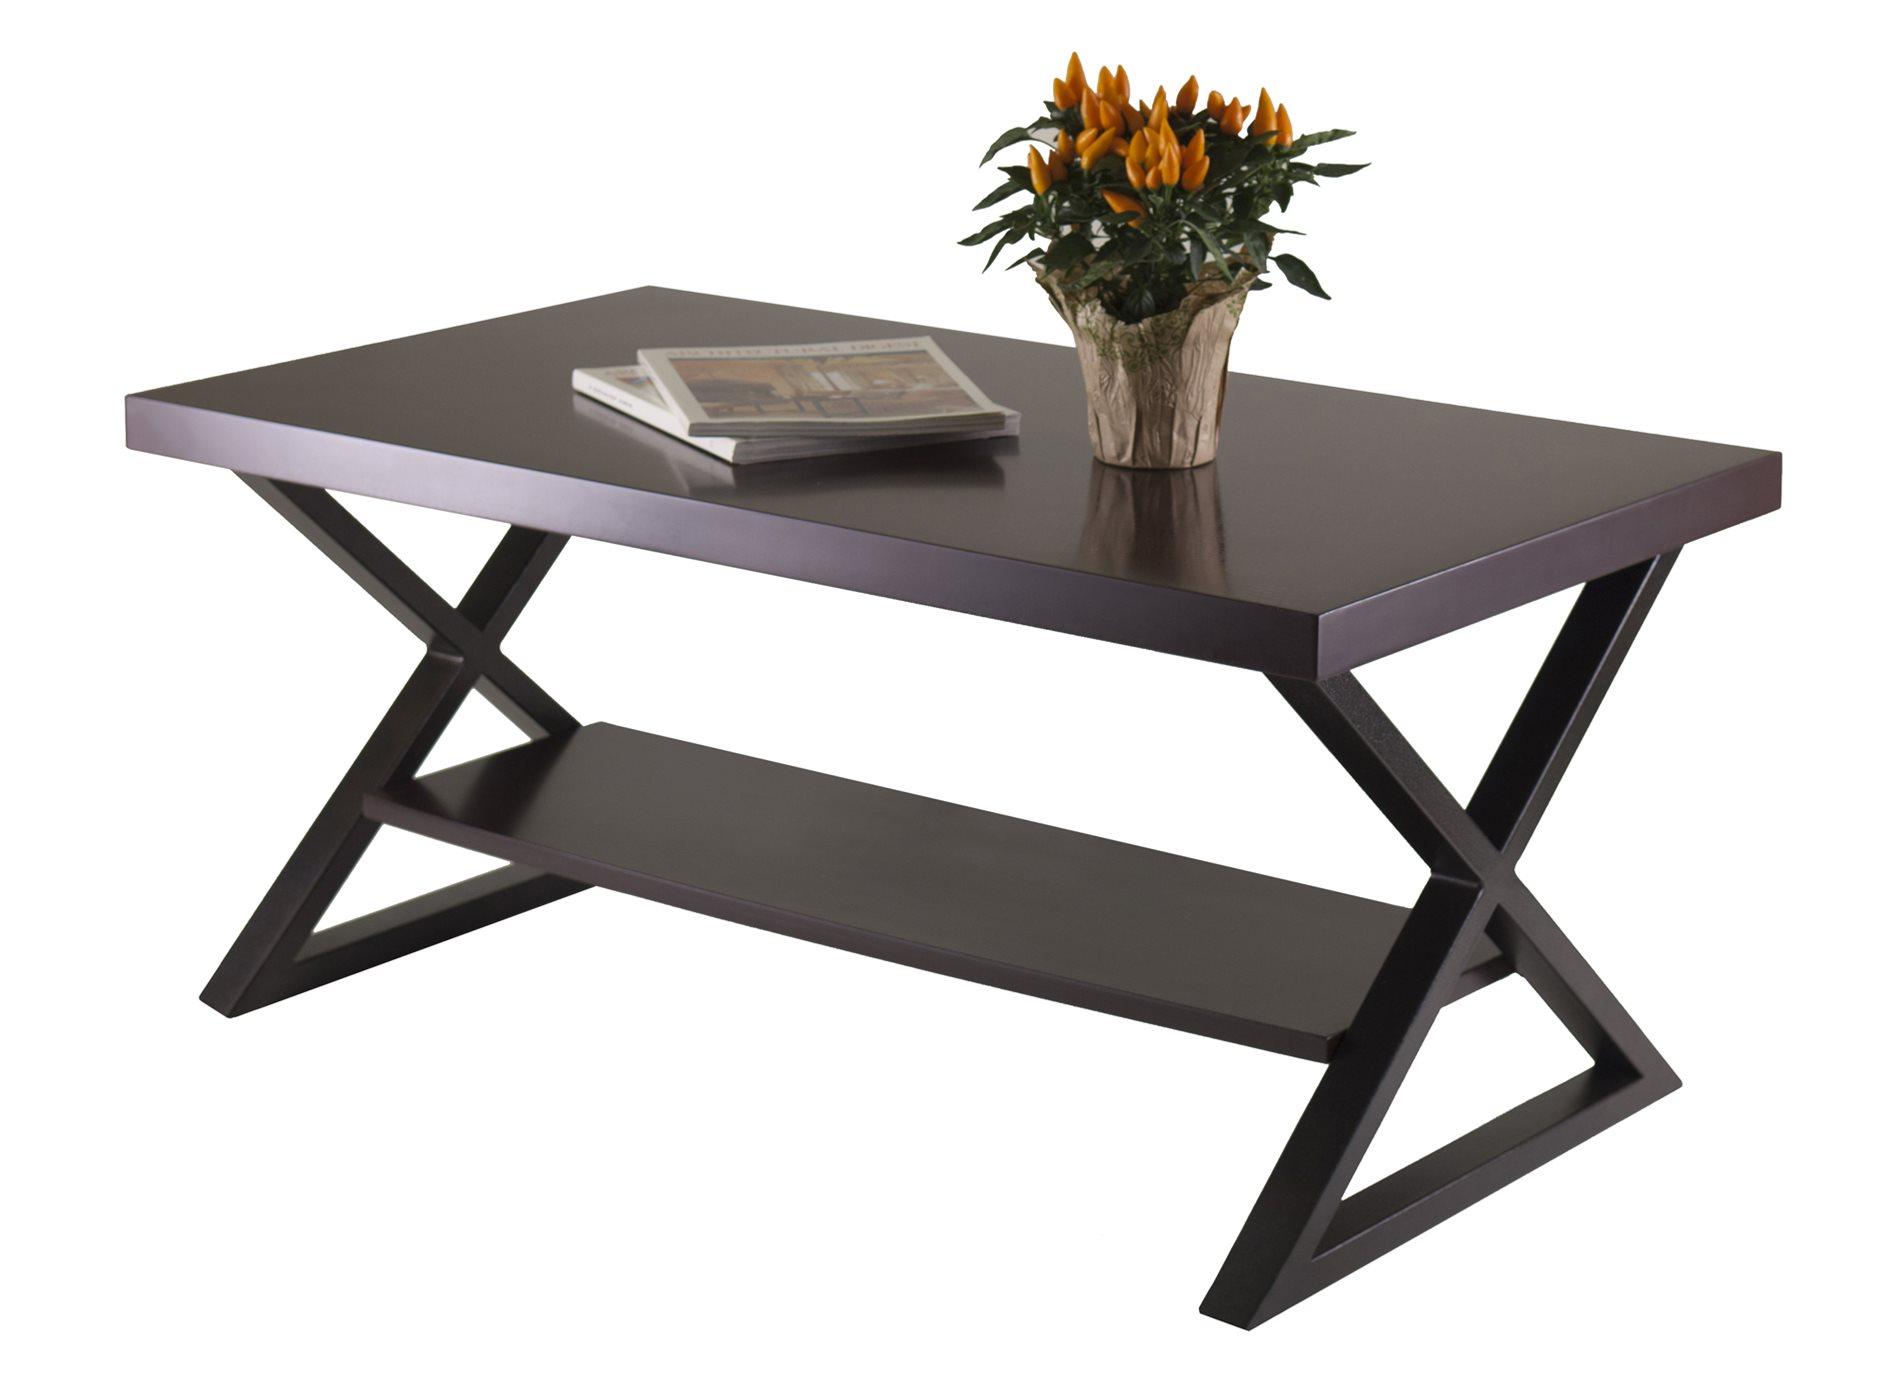 Winsome Wood 40439 Korsa Coffee Table Winw 40439